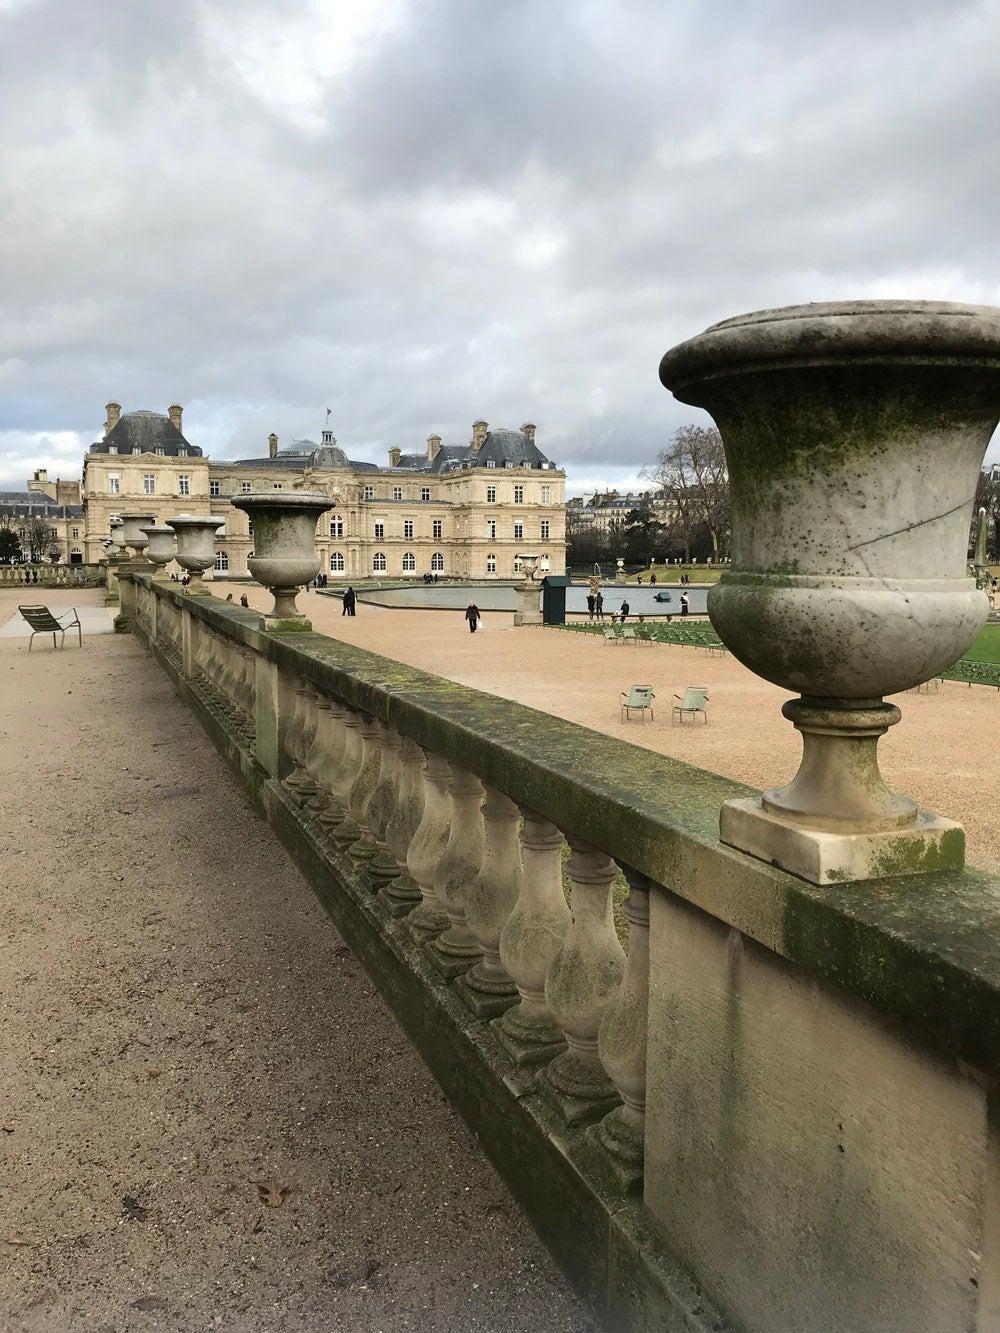 The Jardin du Luxembourg